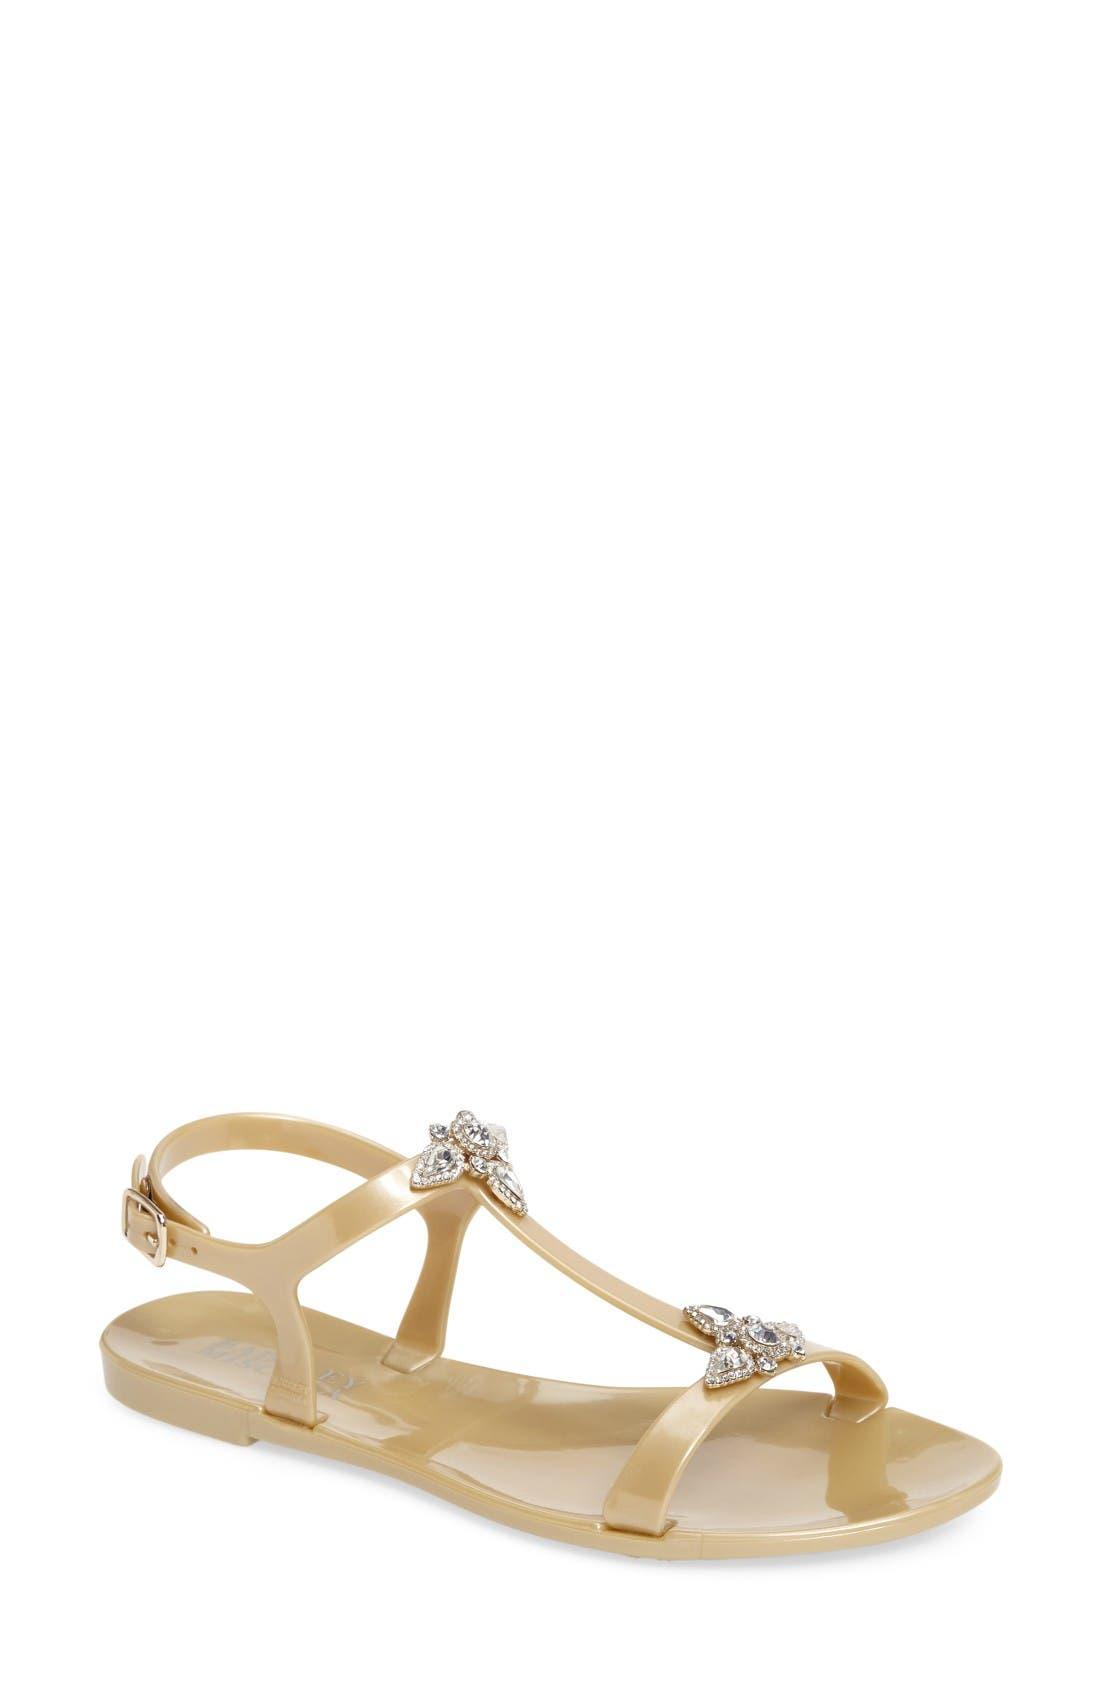 Main Image - Badgley Mischka Belize Crystal Embellished Flat Sandal (Women)